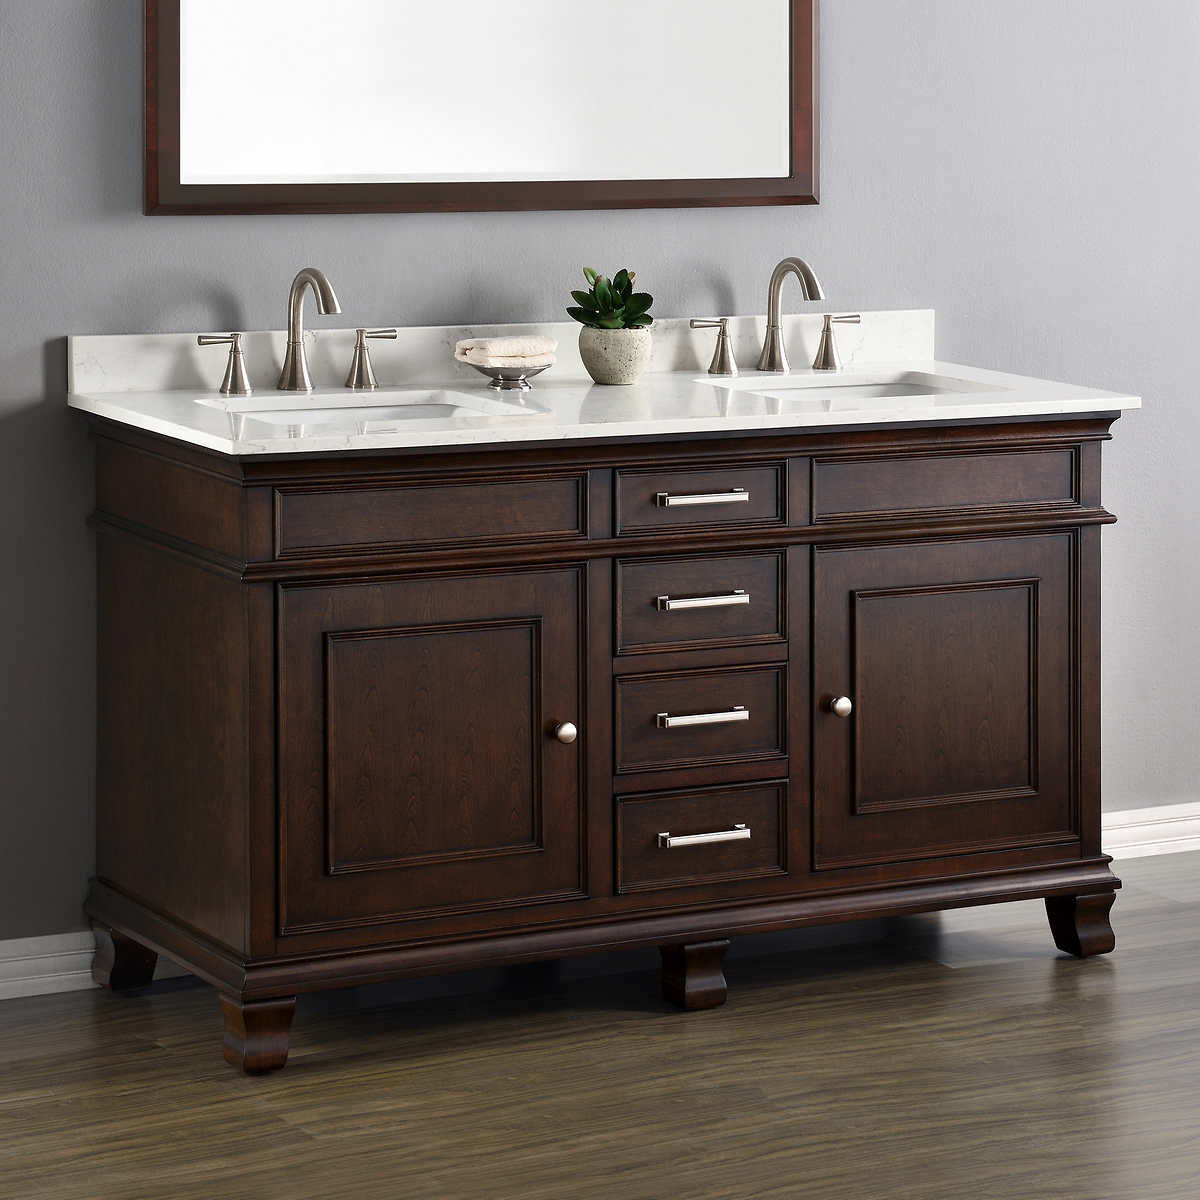 lanza bathroom vanities  enwe, Bathroom decor